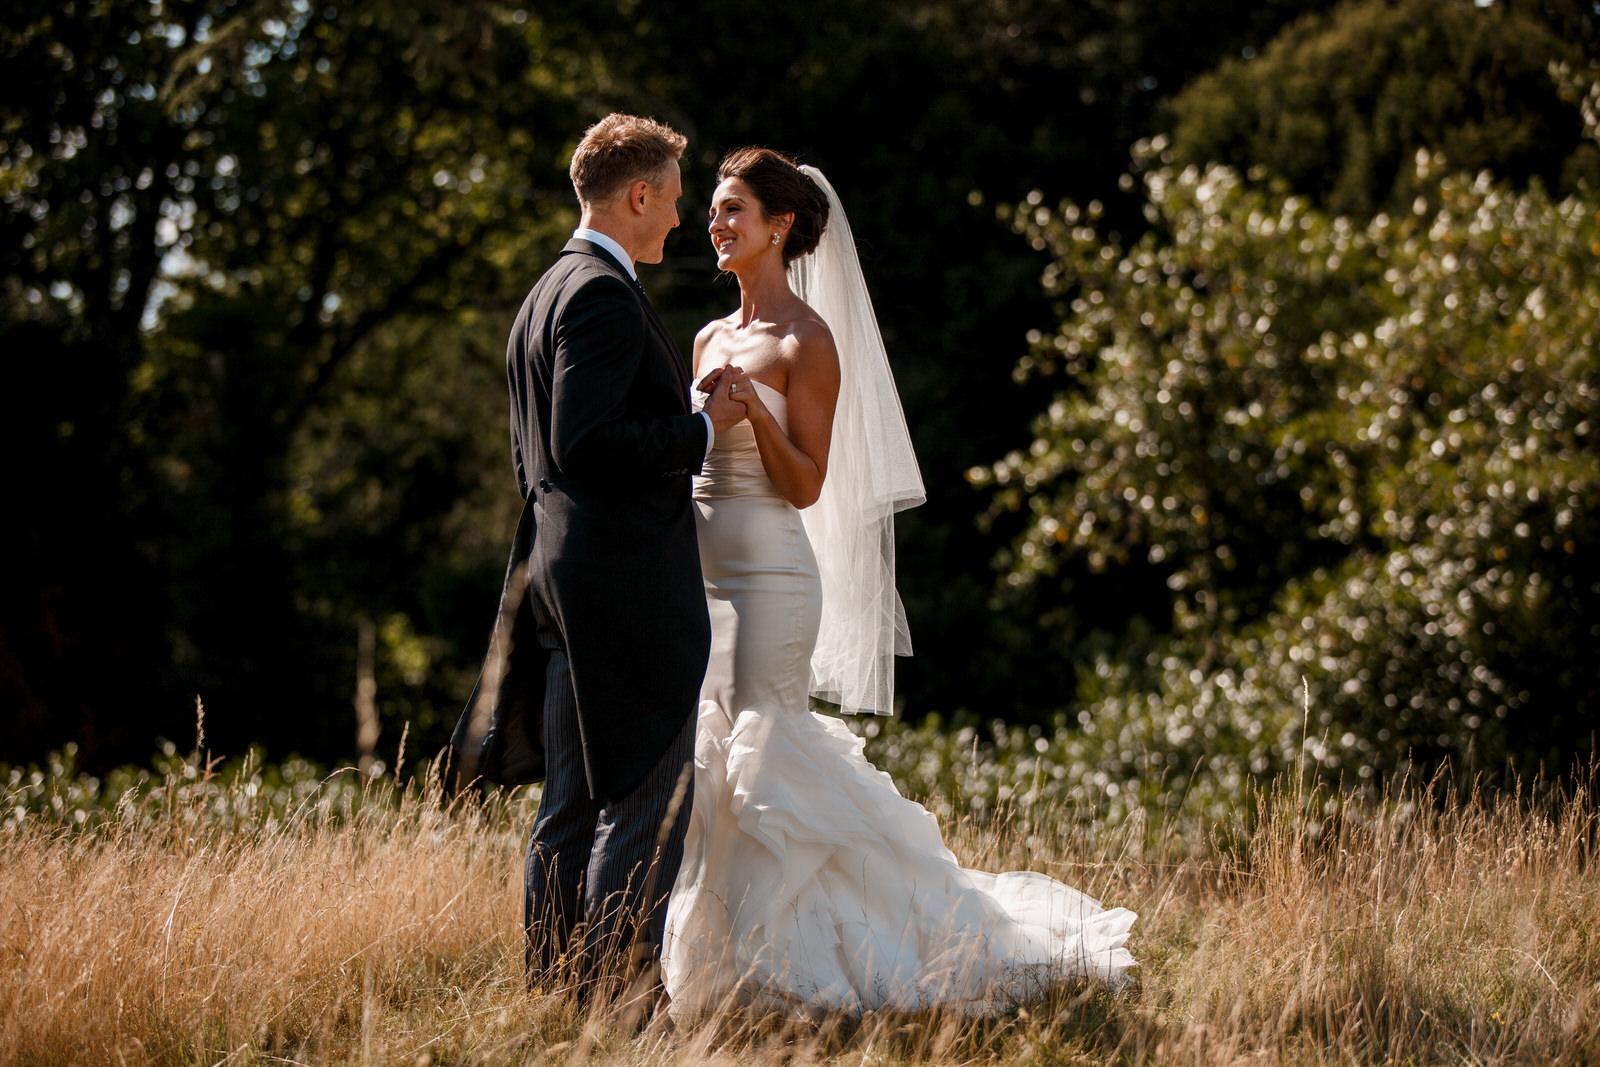 Home counties wedding photography by Damion Mower on English-Wedding.com (23)